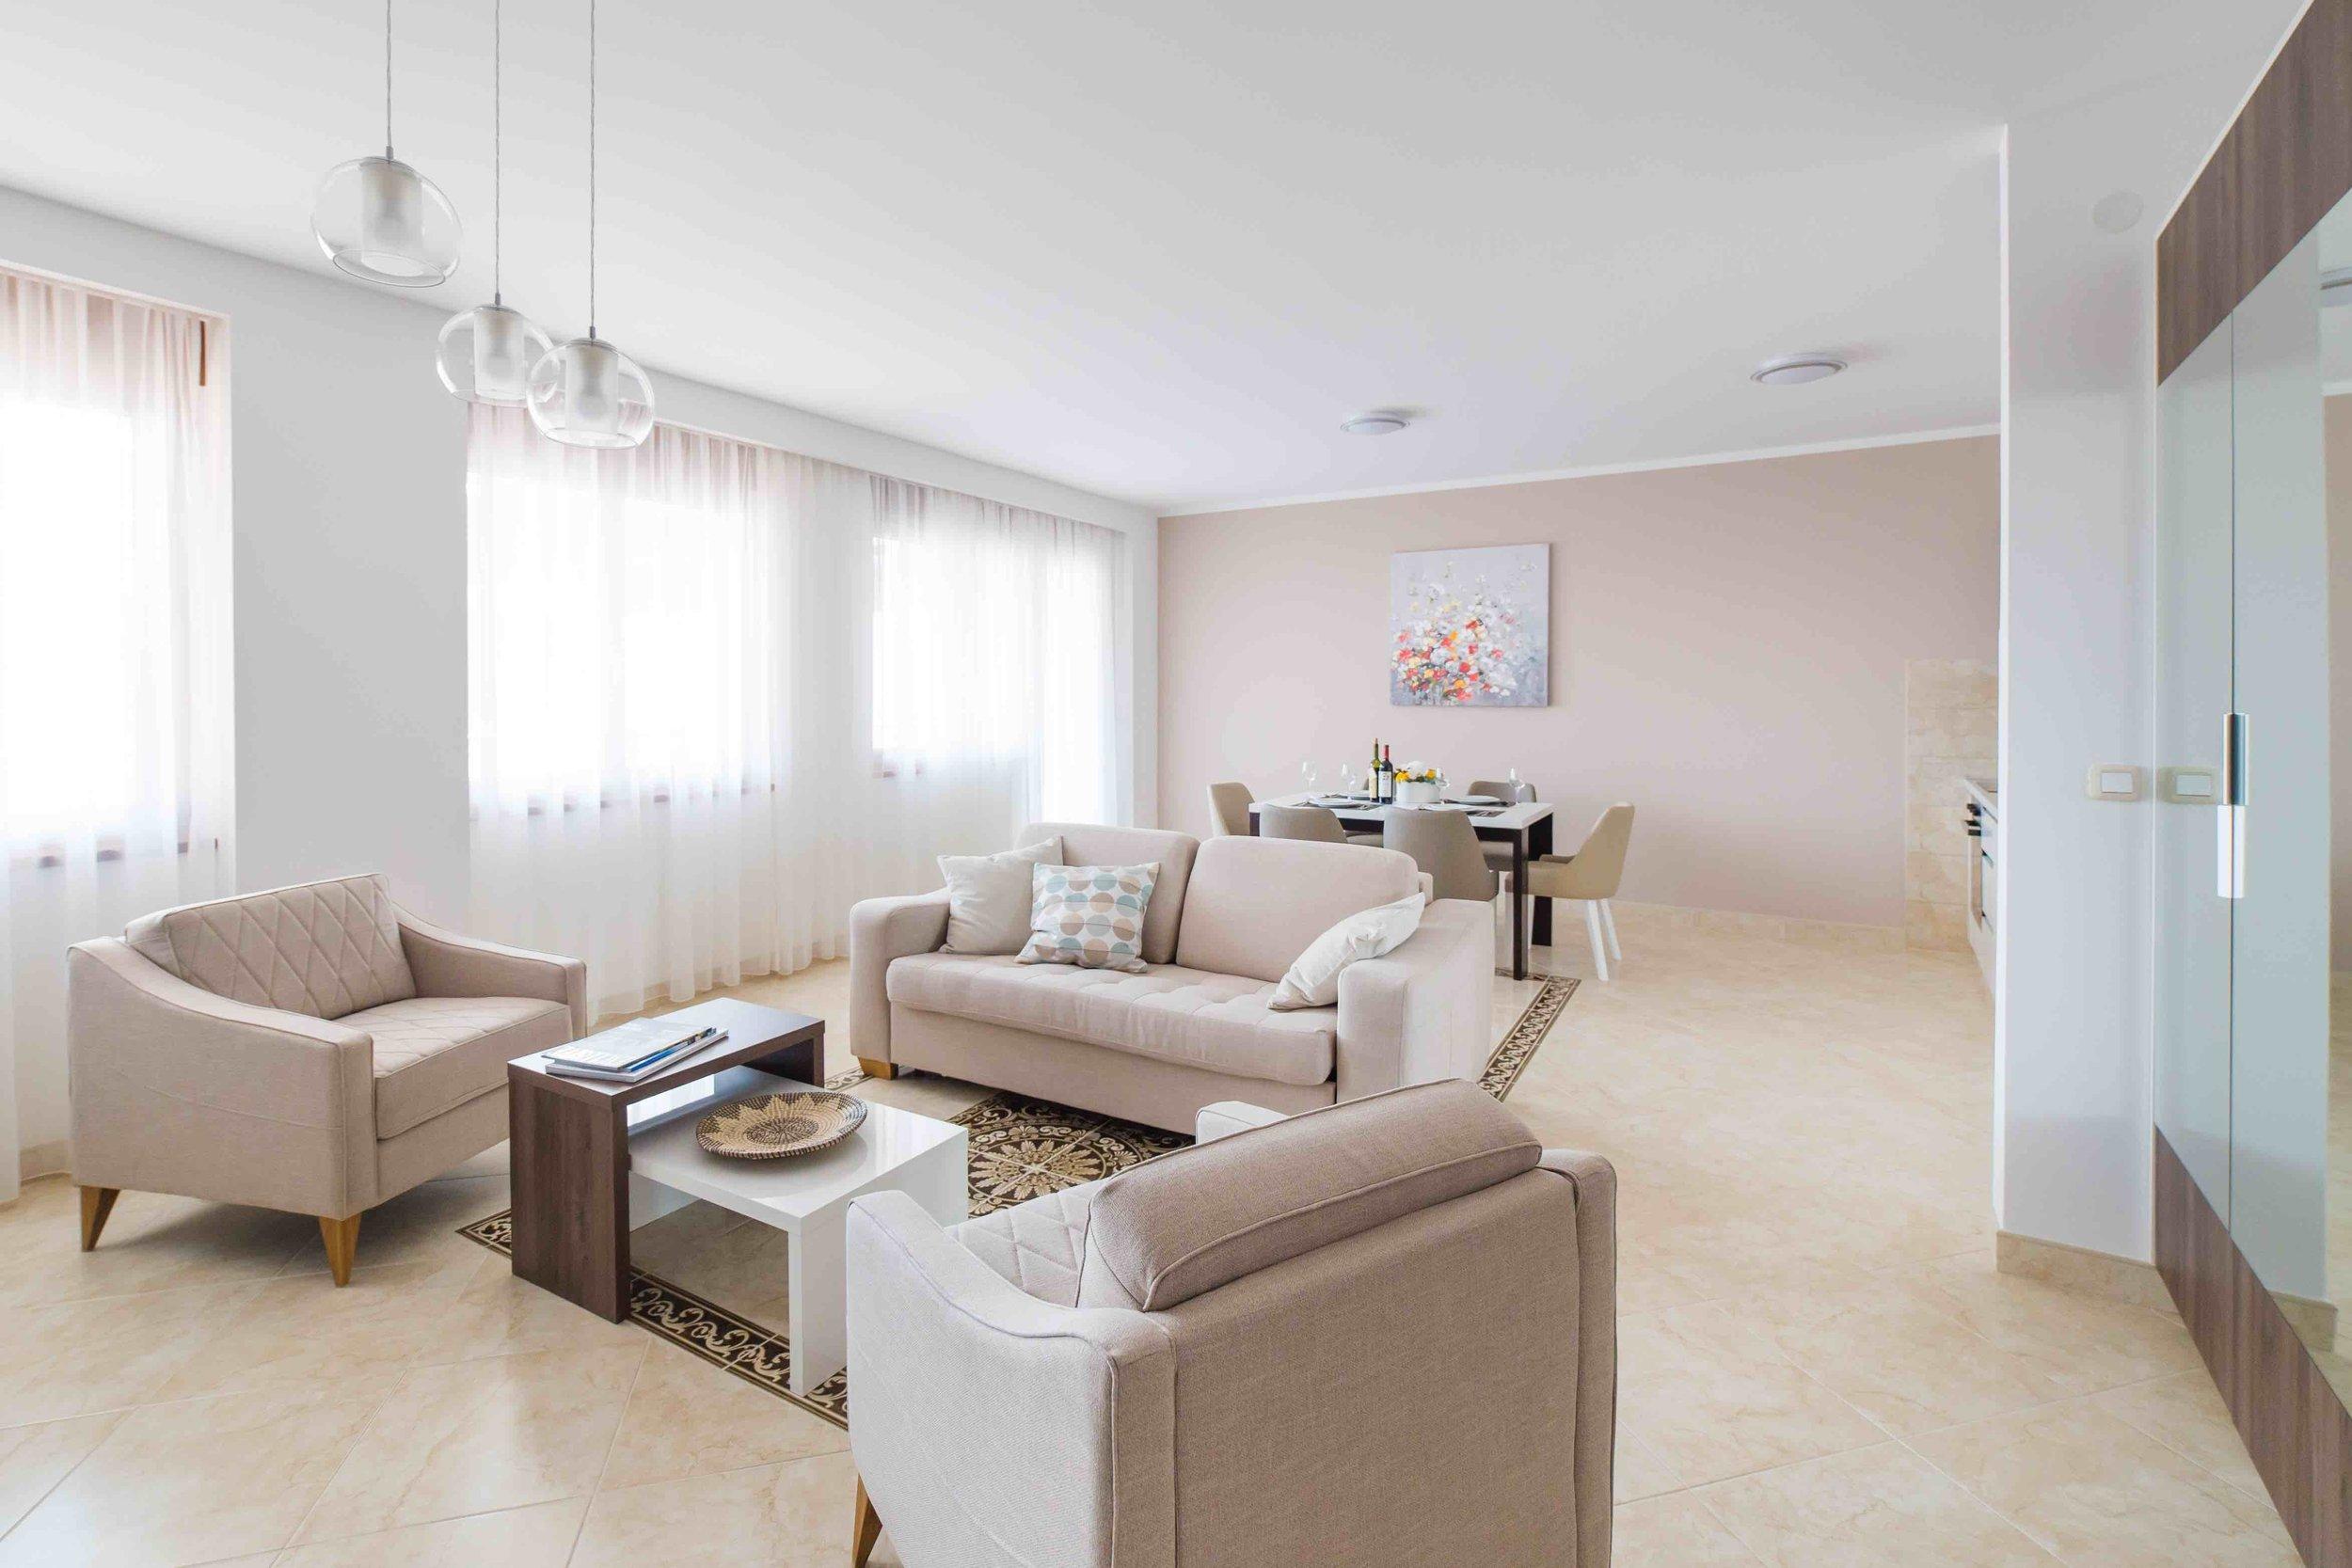 Aparthotel Апартотель | Anatolia |Becici Бечичи | Budva Будва | Montenegro Черногория | Apartments Апартаменты | Rents Аренда 13.jpg